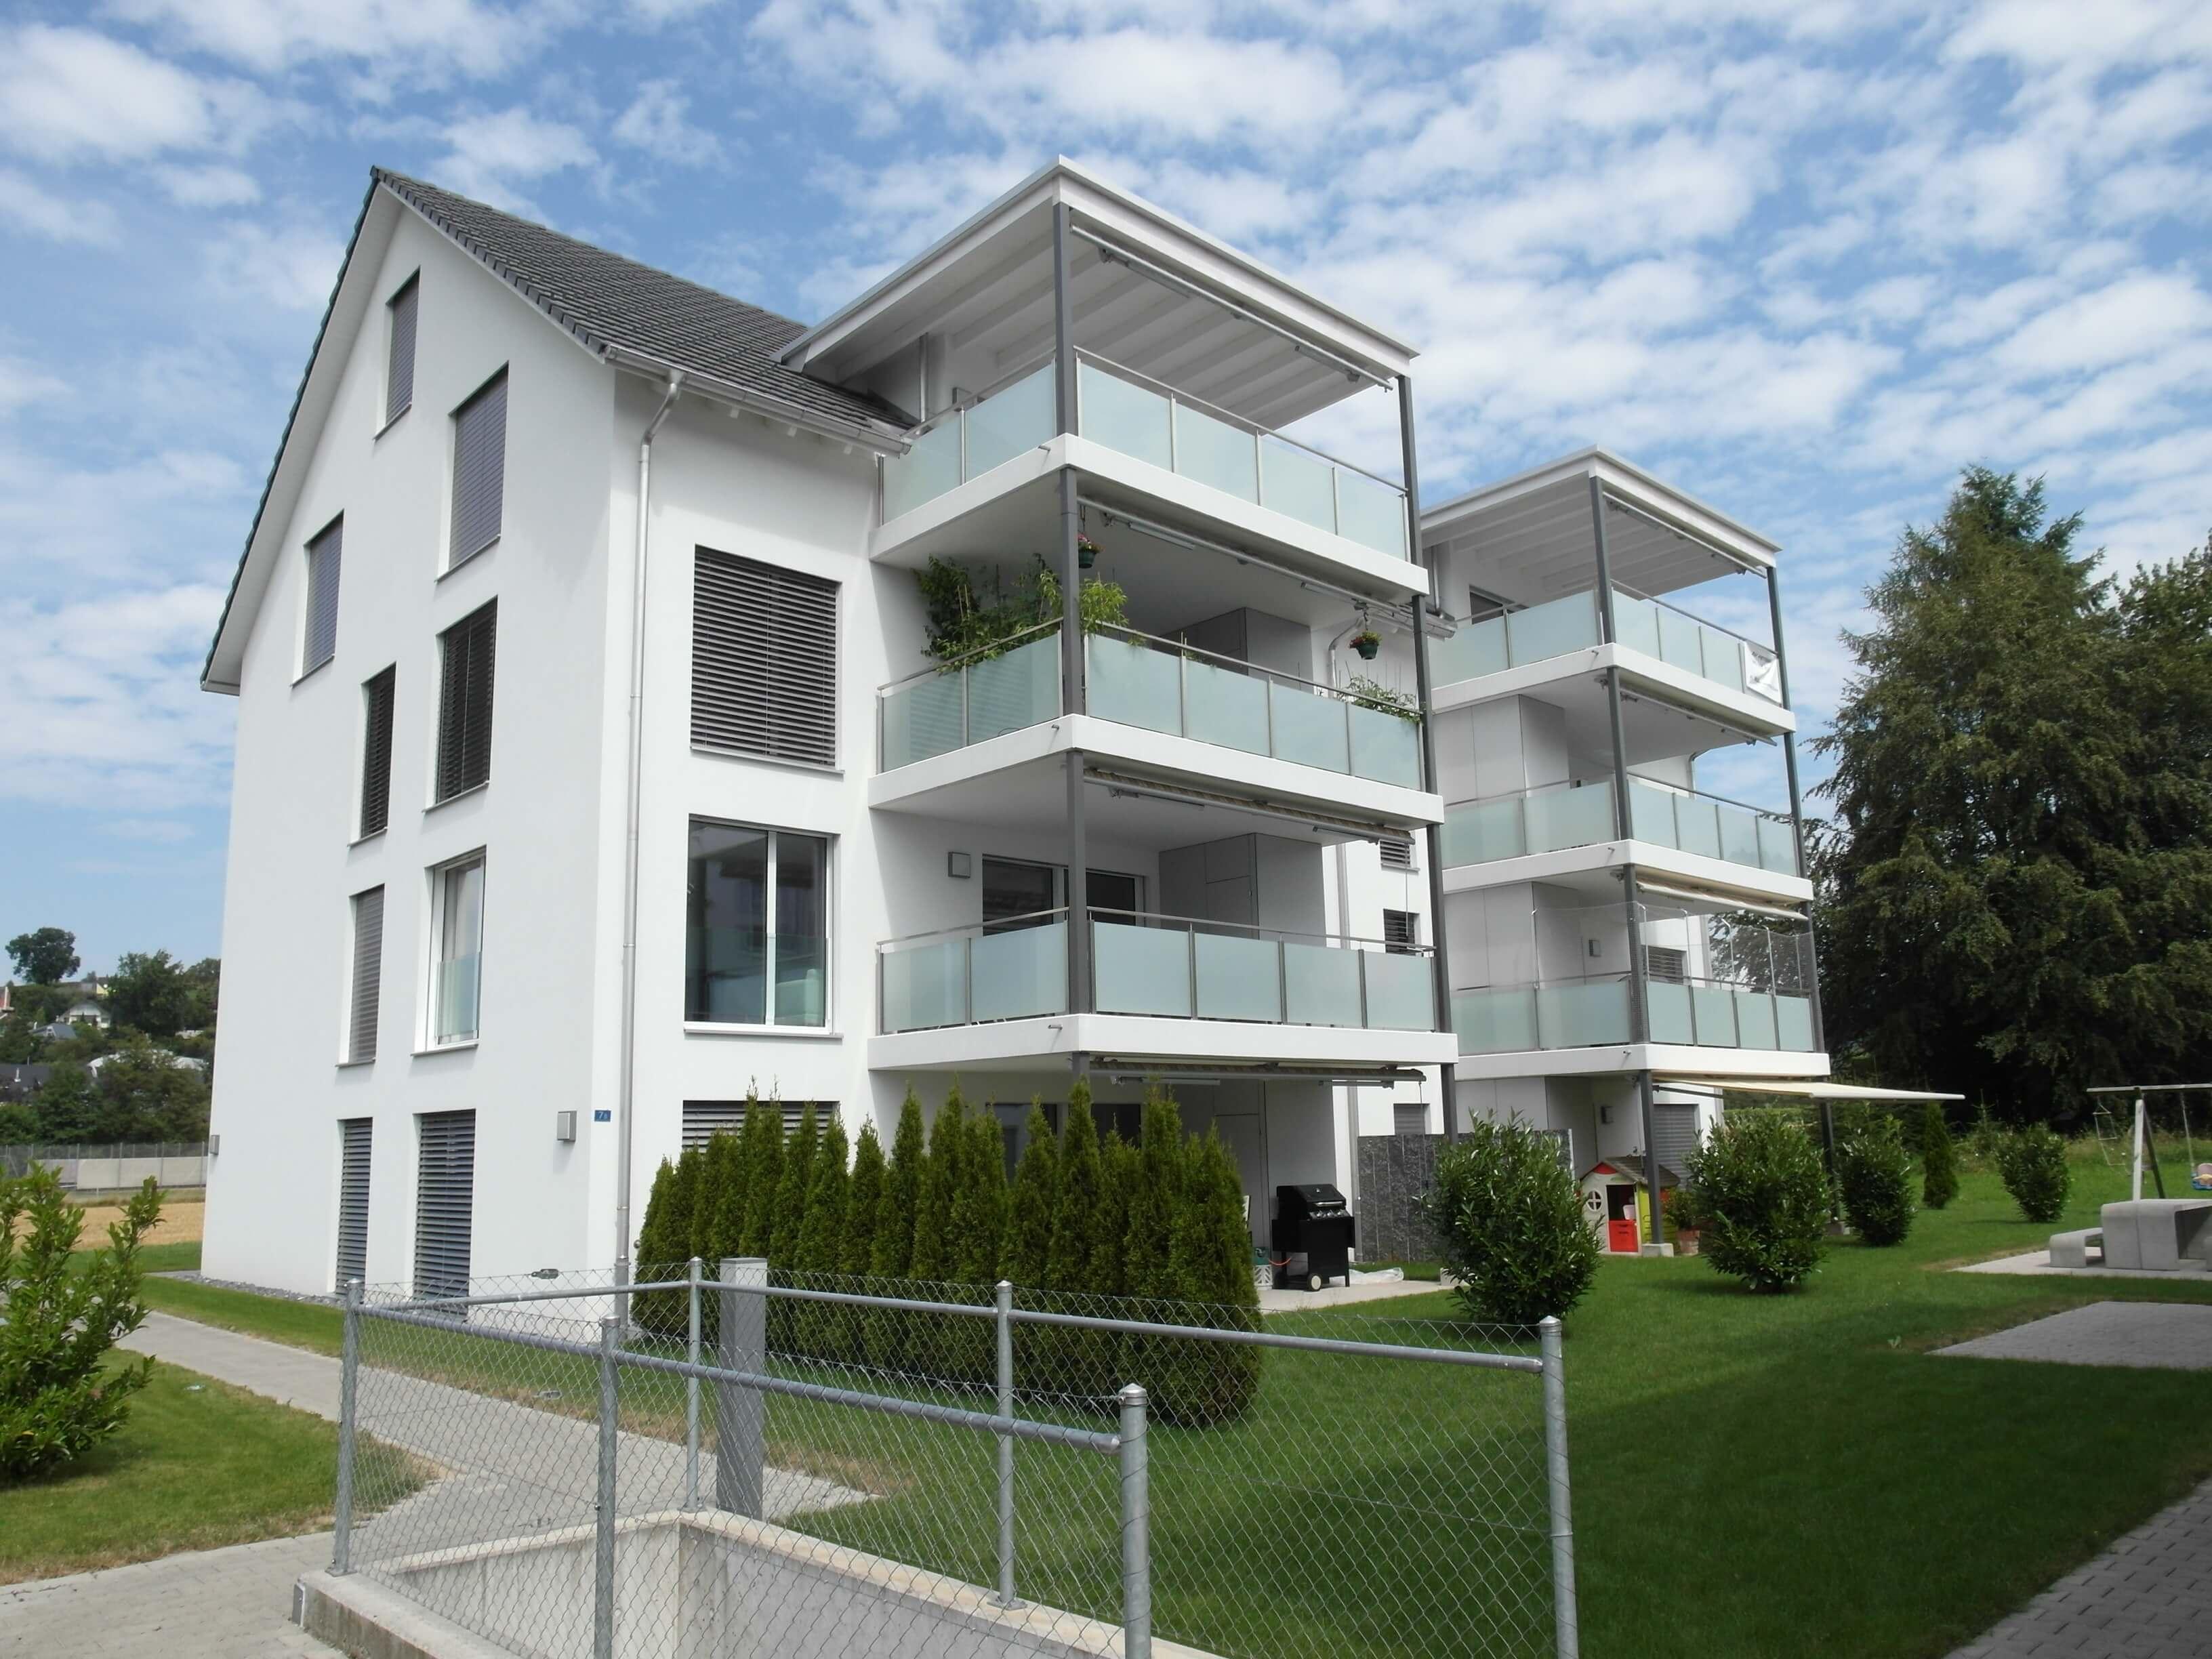 MFH Talstrasse, Hirschthal